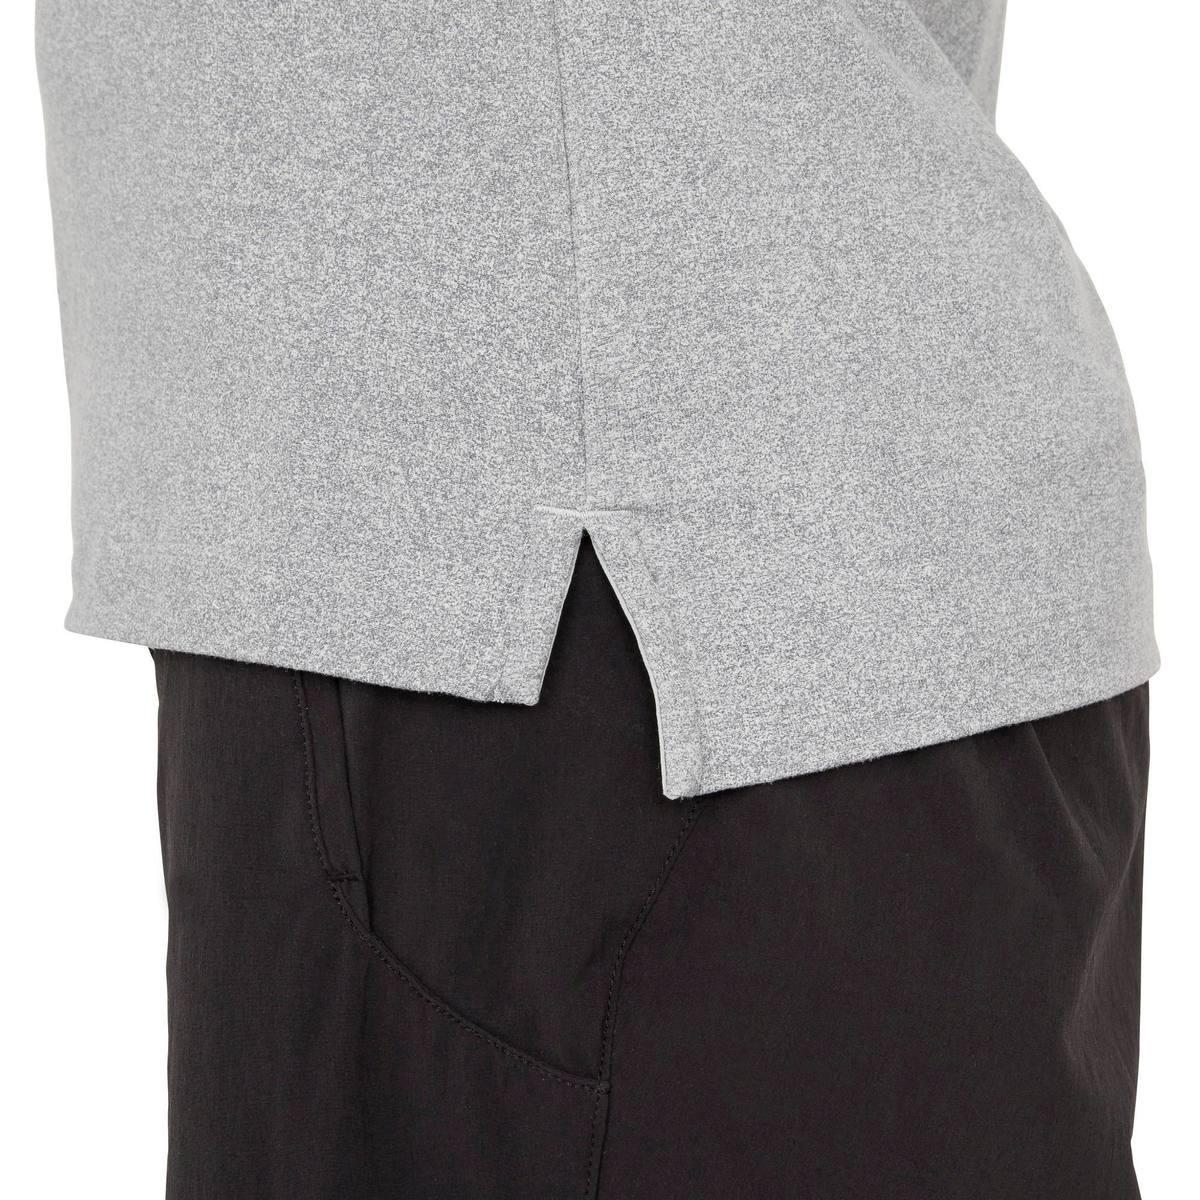 Bild 5 von Poloshirt kurzarm Segeln Race Damen grau